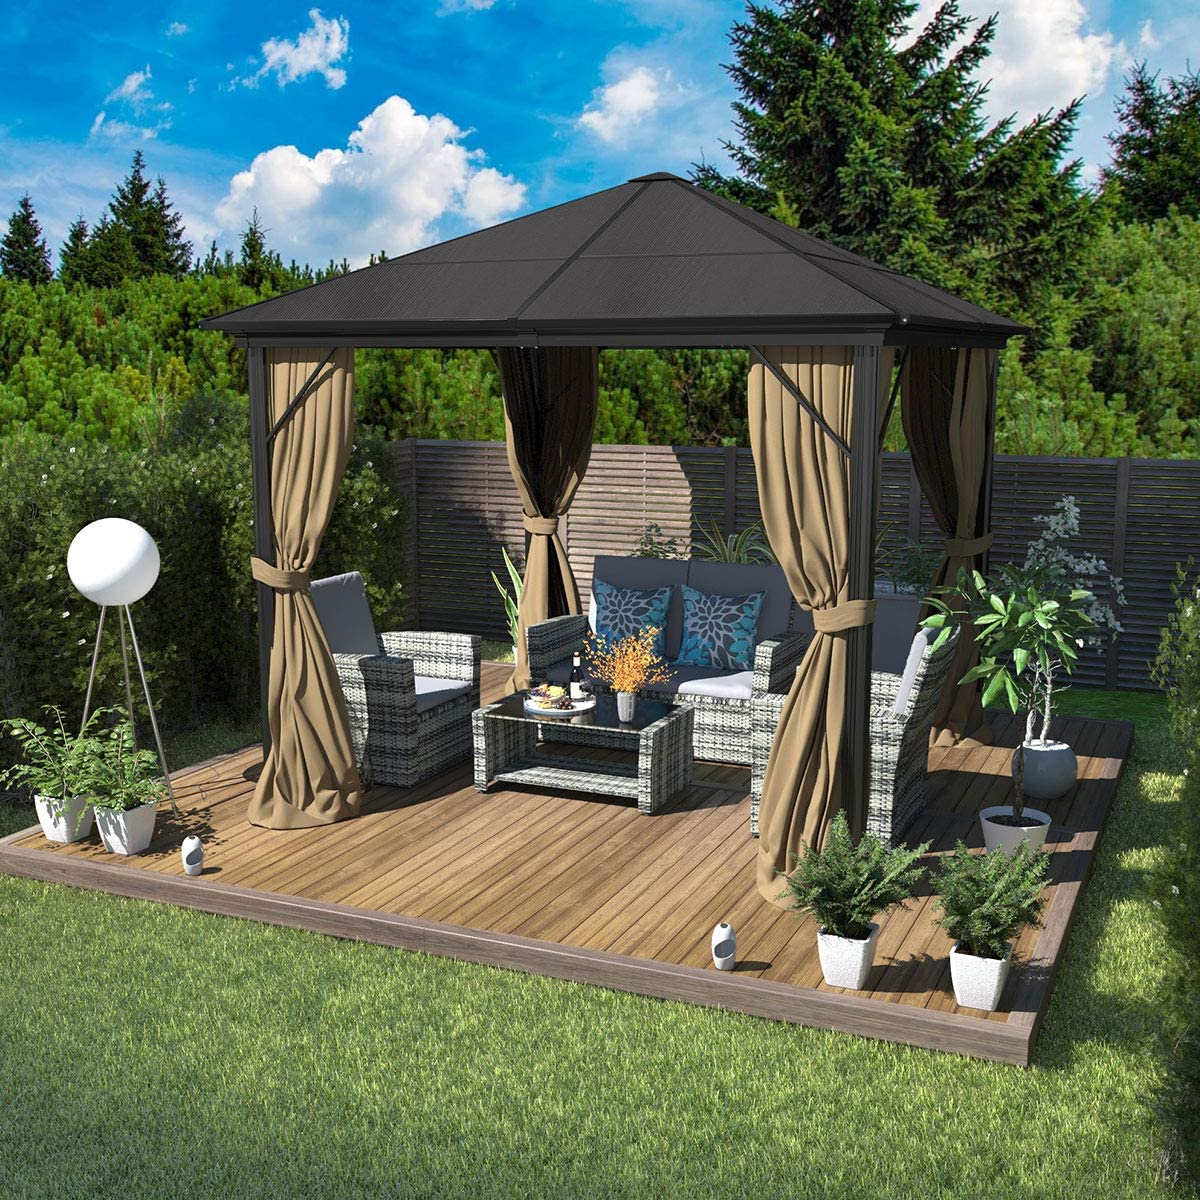 YITAHOME 10X10 ft Outdoor Canopy Gazebo